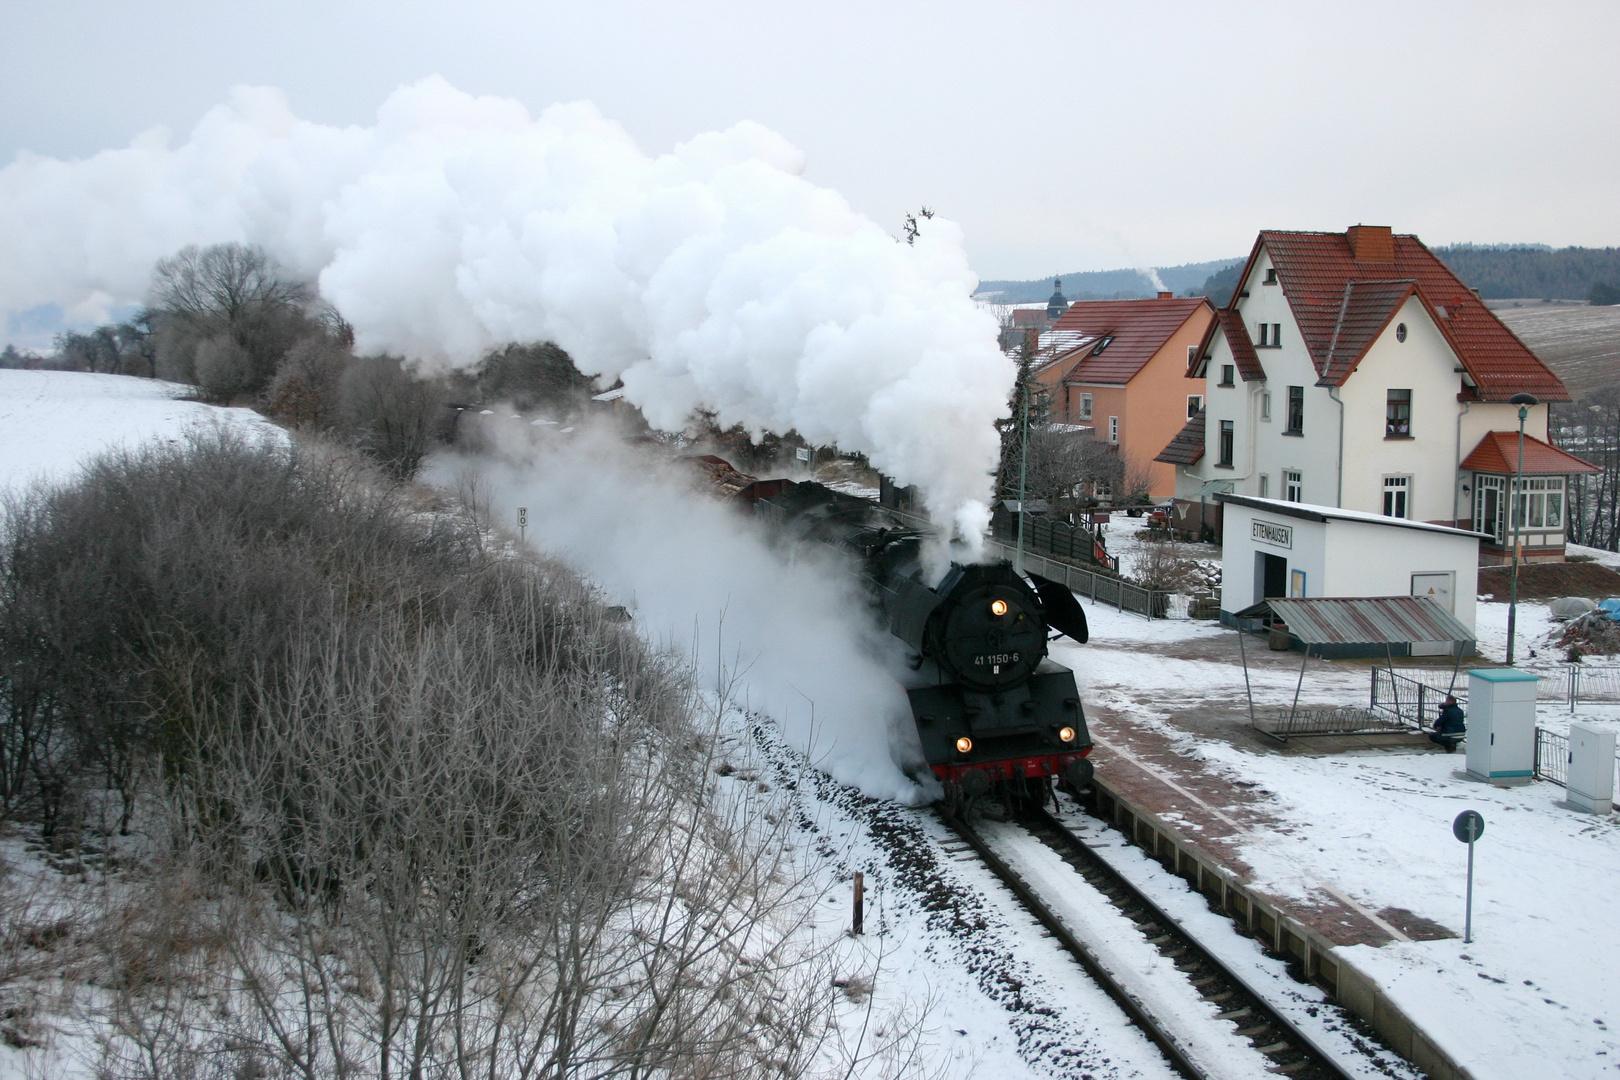 Winter in Ettenhausen